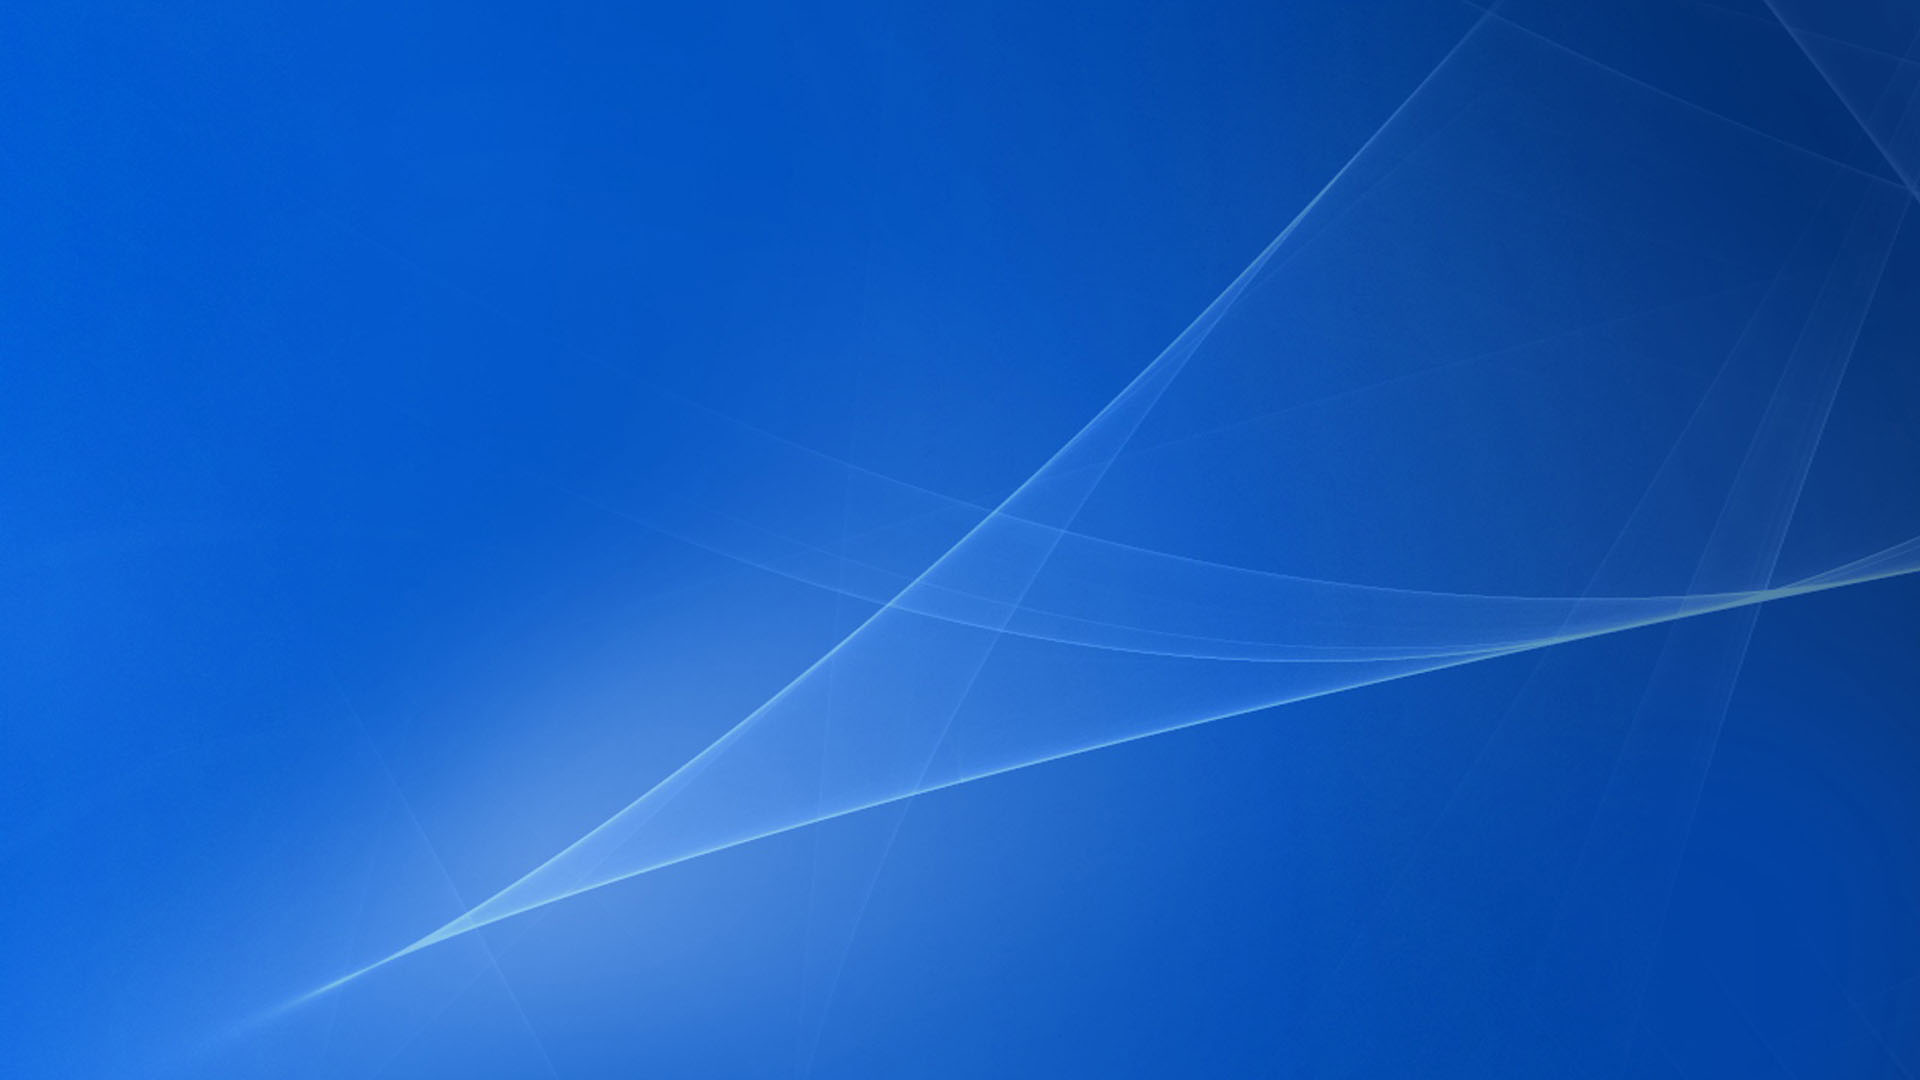 [46+] Acer Wallpaper 1080p HD 1920x1080 on WallpaperSafari